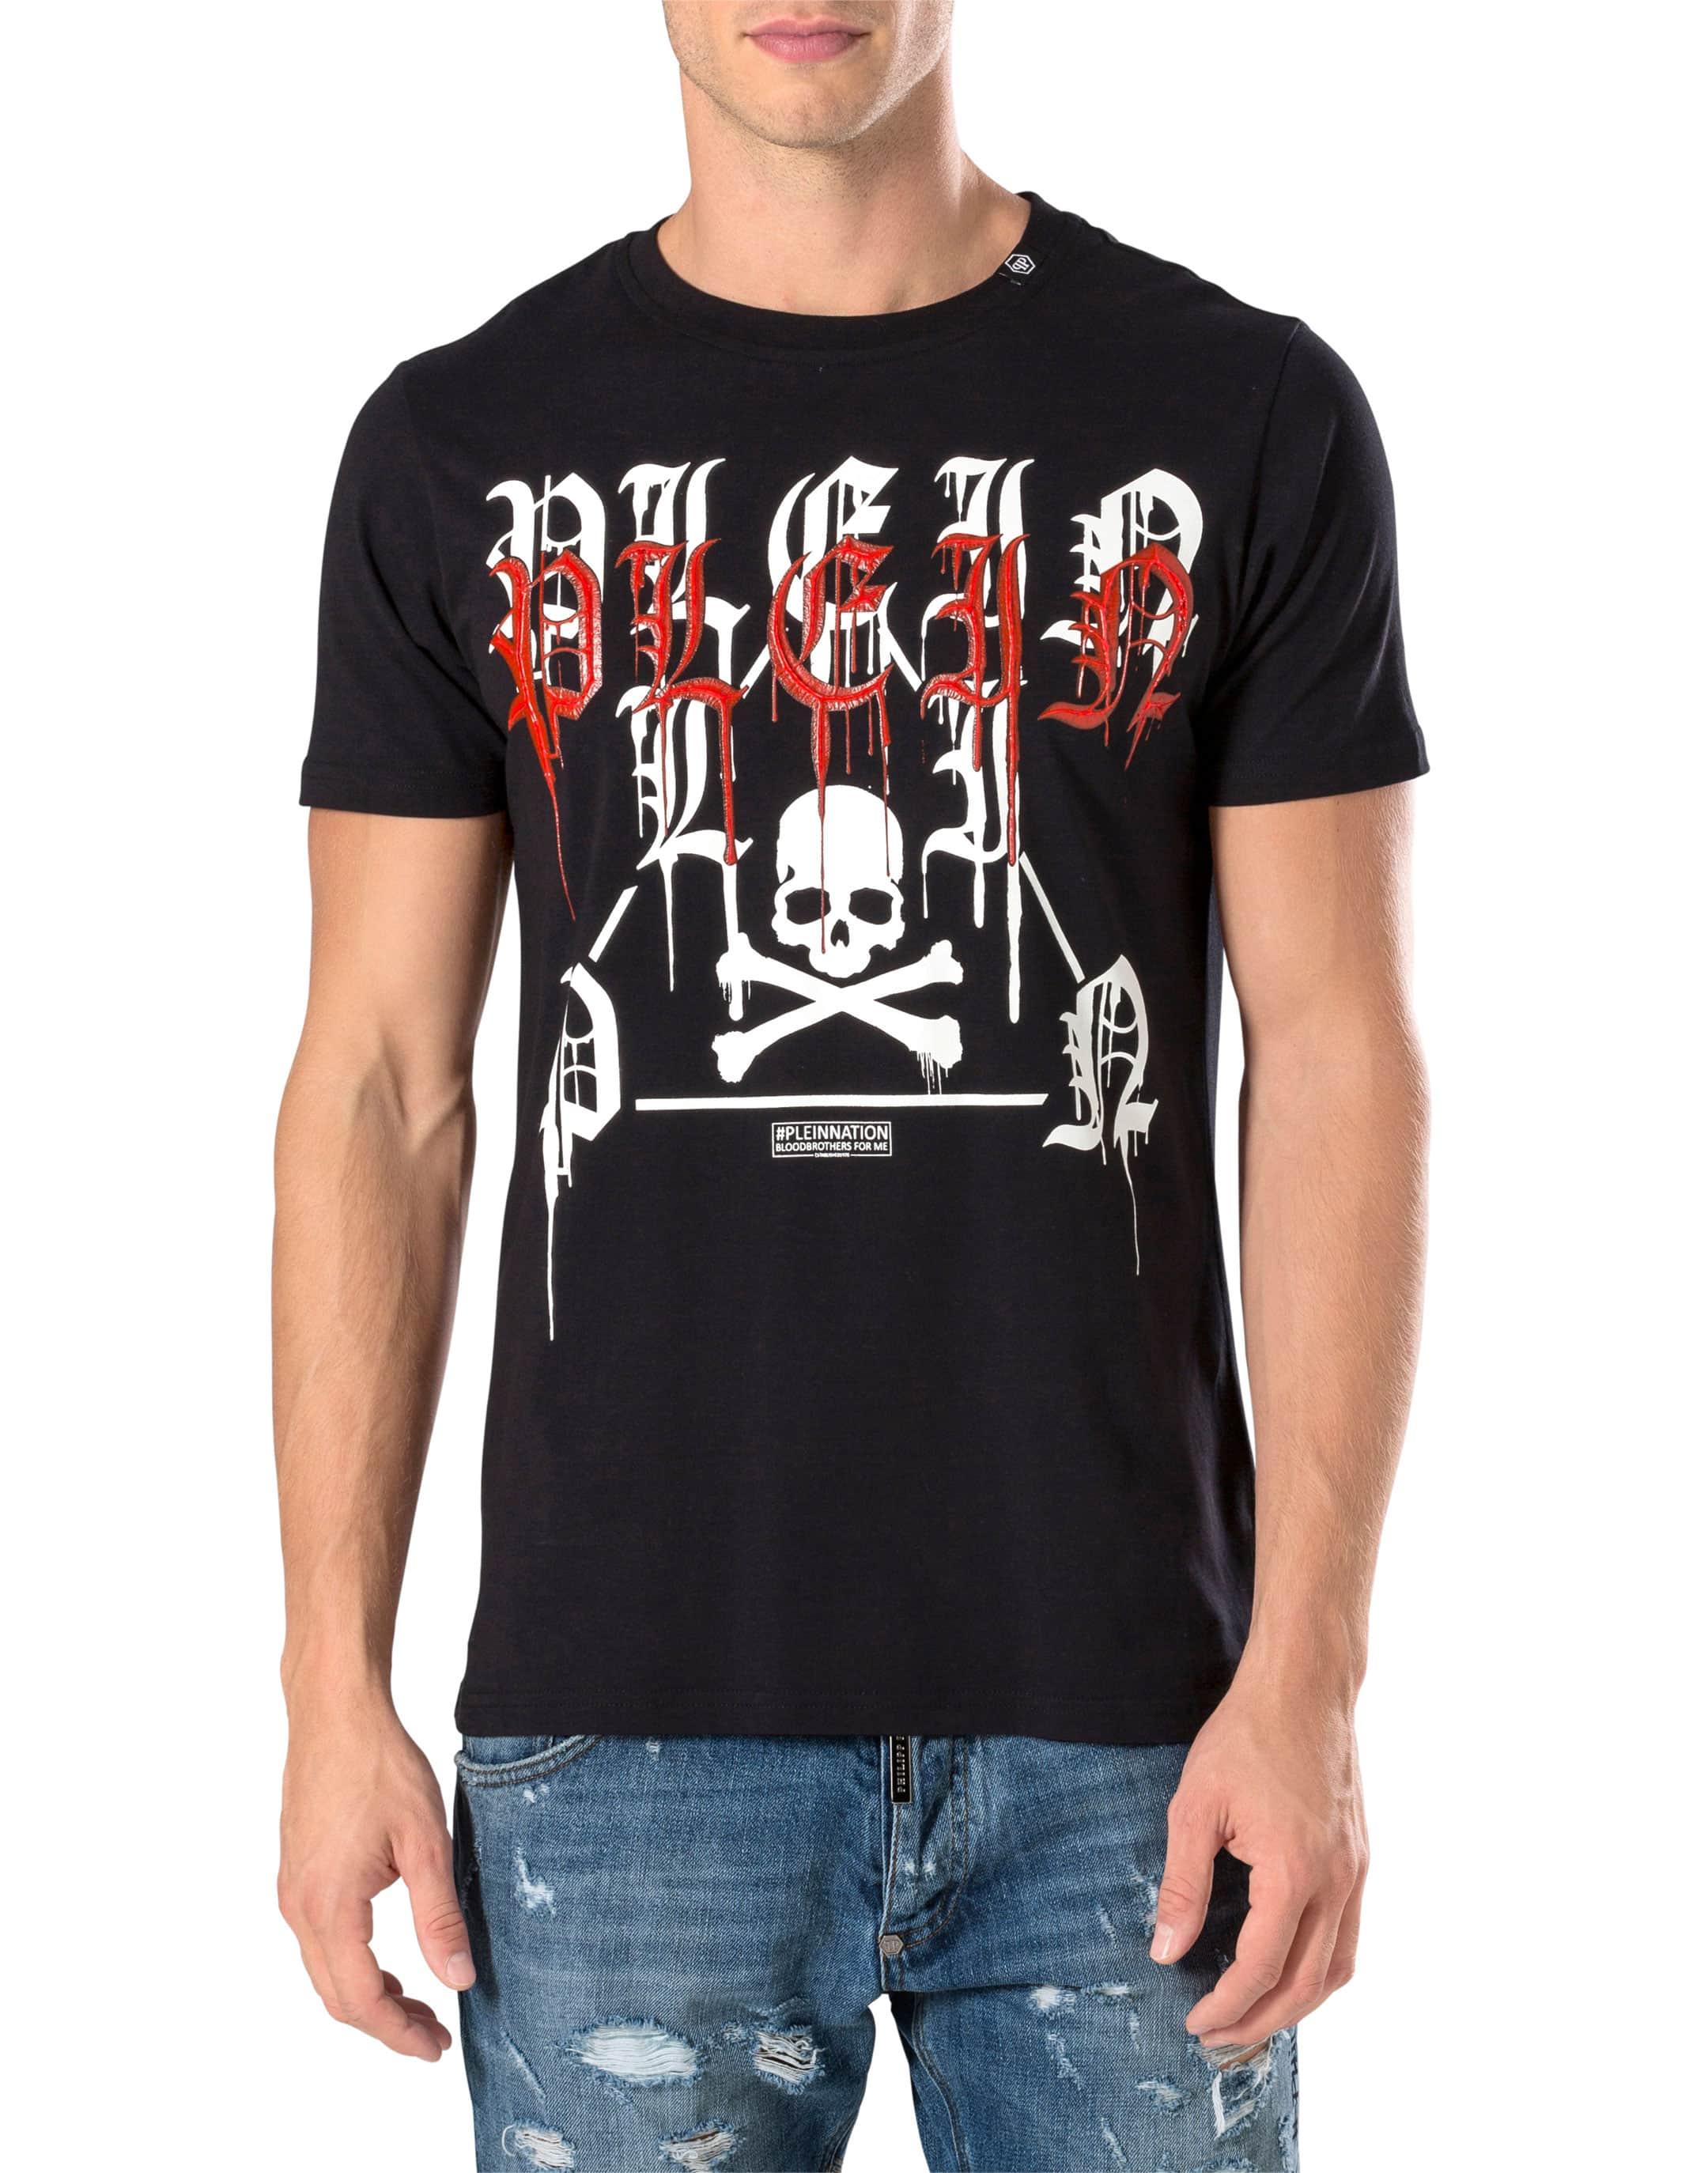 SS Fancy T-shirt - Black Philipp Plein Free Shipping Newest mBOYYD